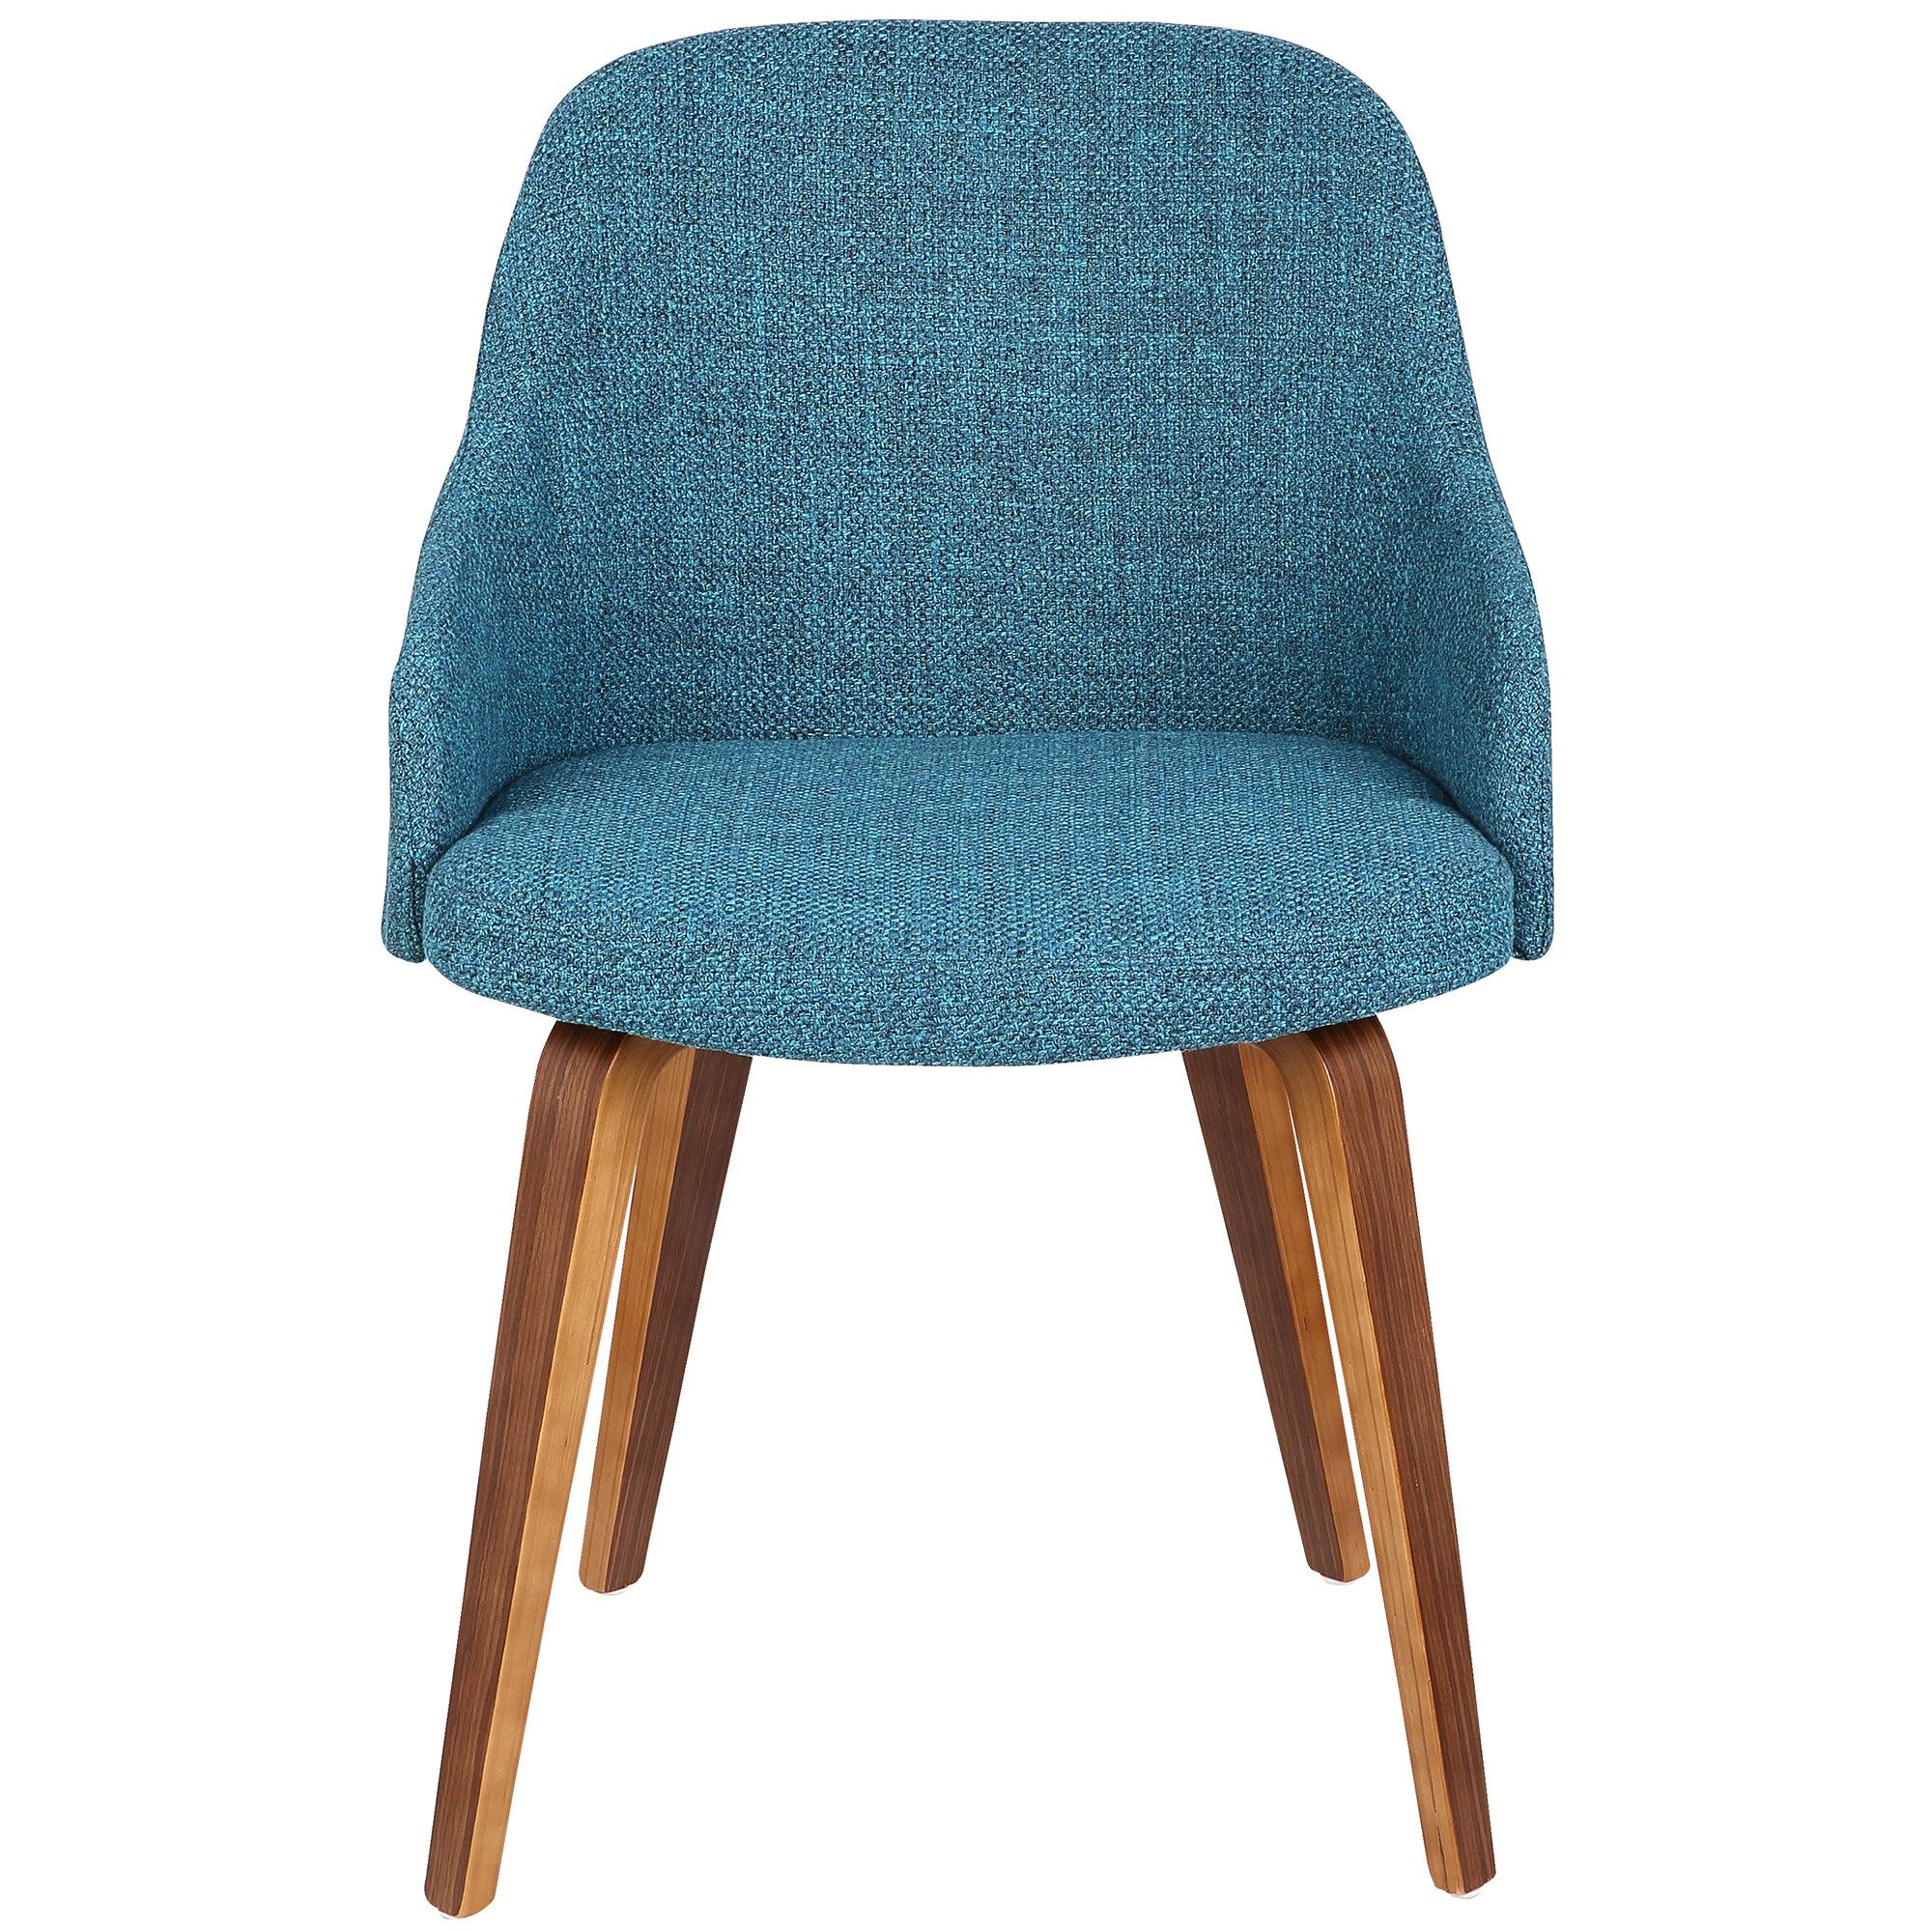 mid century dining chair. brighton mid-century modern upholstered dining chair \u0026 reviews | joss main mid century i